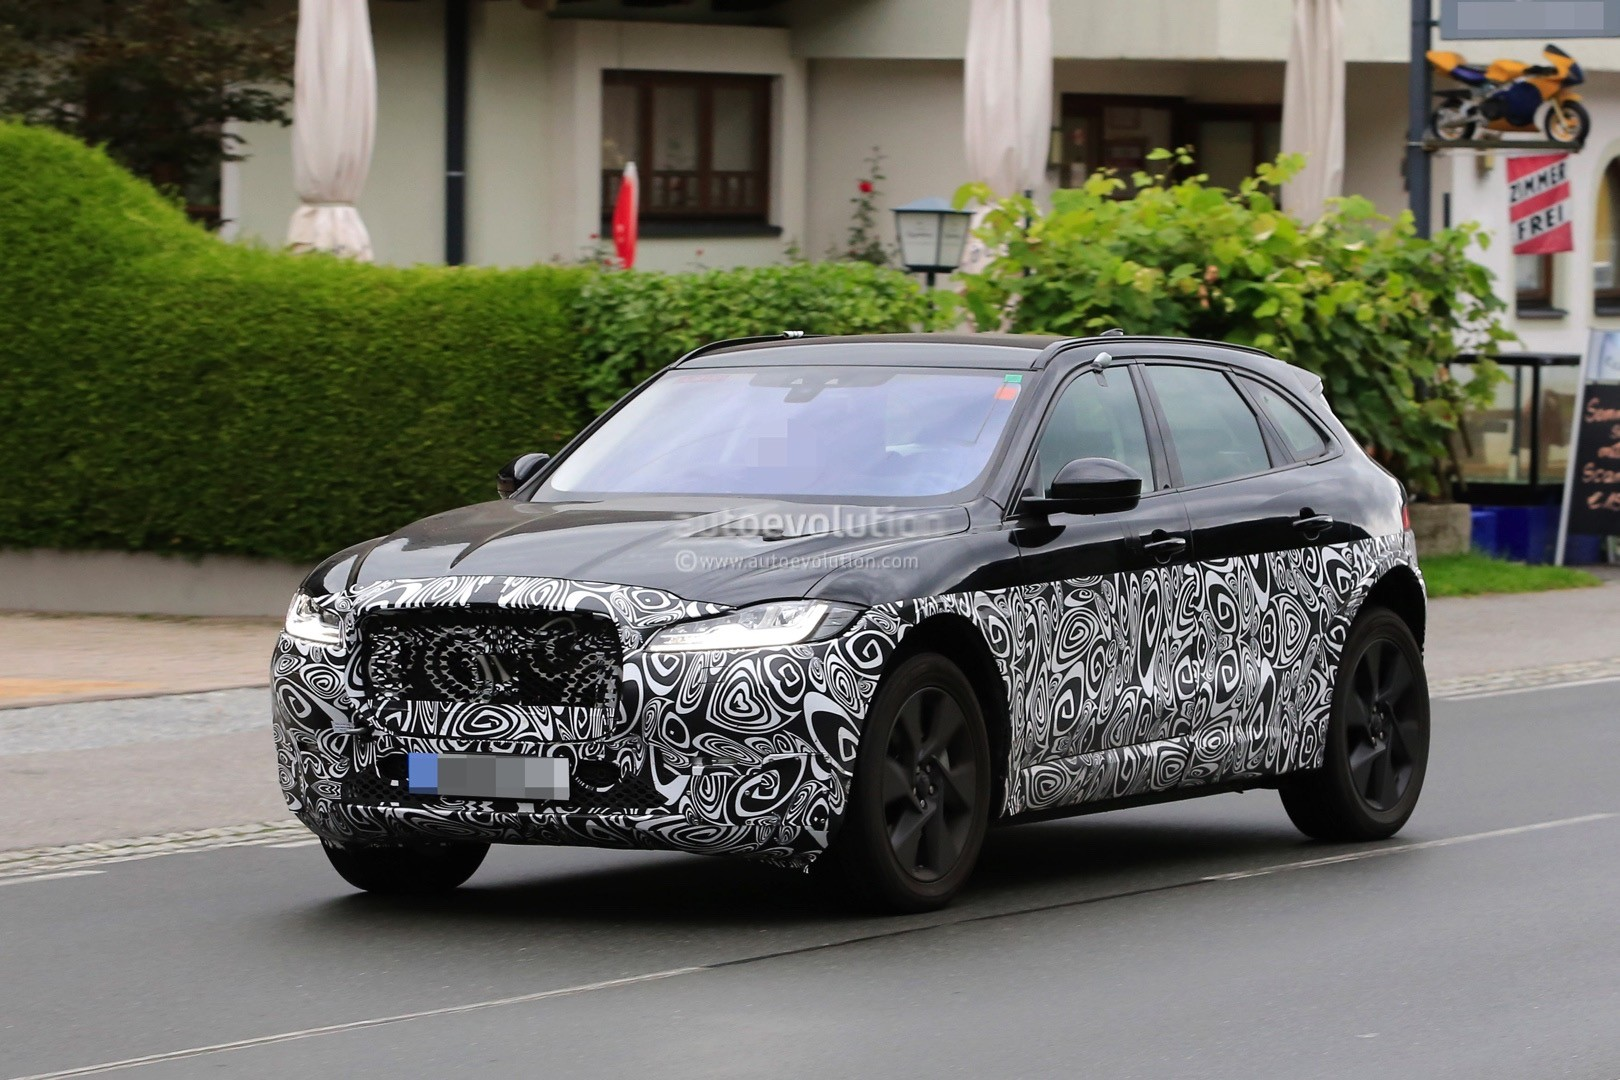 Jaguar F Pace Plug In Hybrid >> Jaguar's Electric SUV Teased Ahead of 2016 LA Auto Show ...